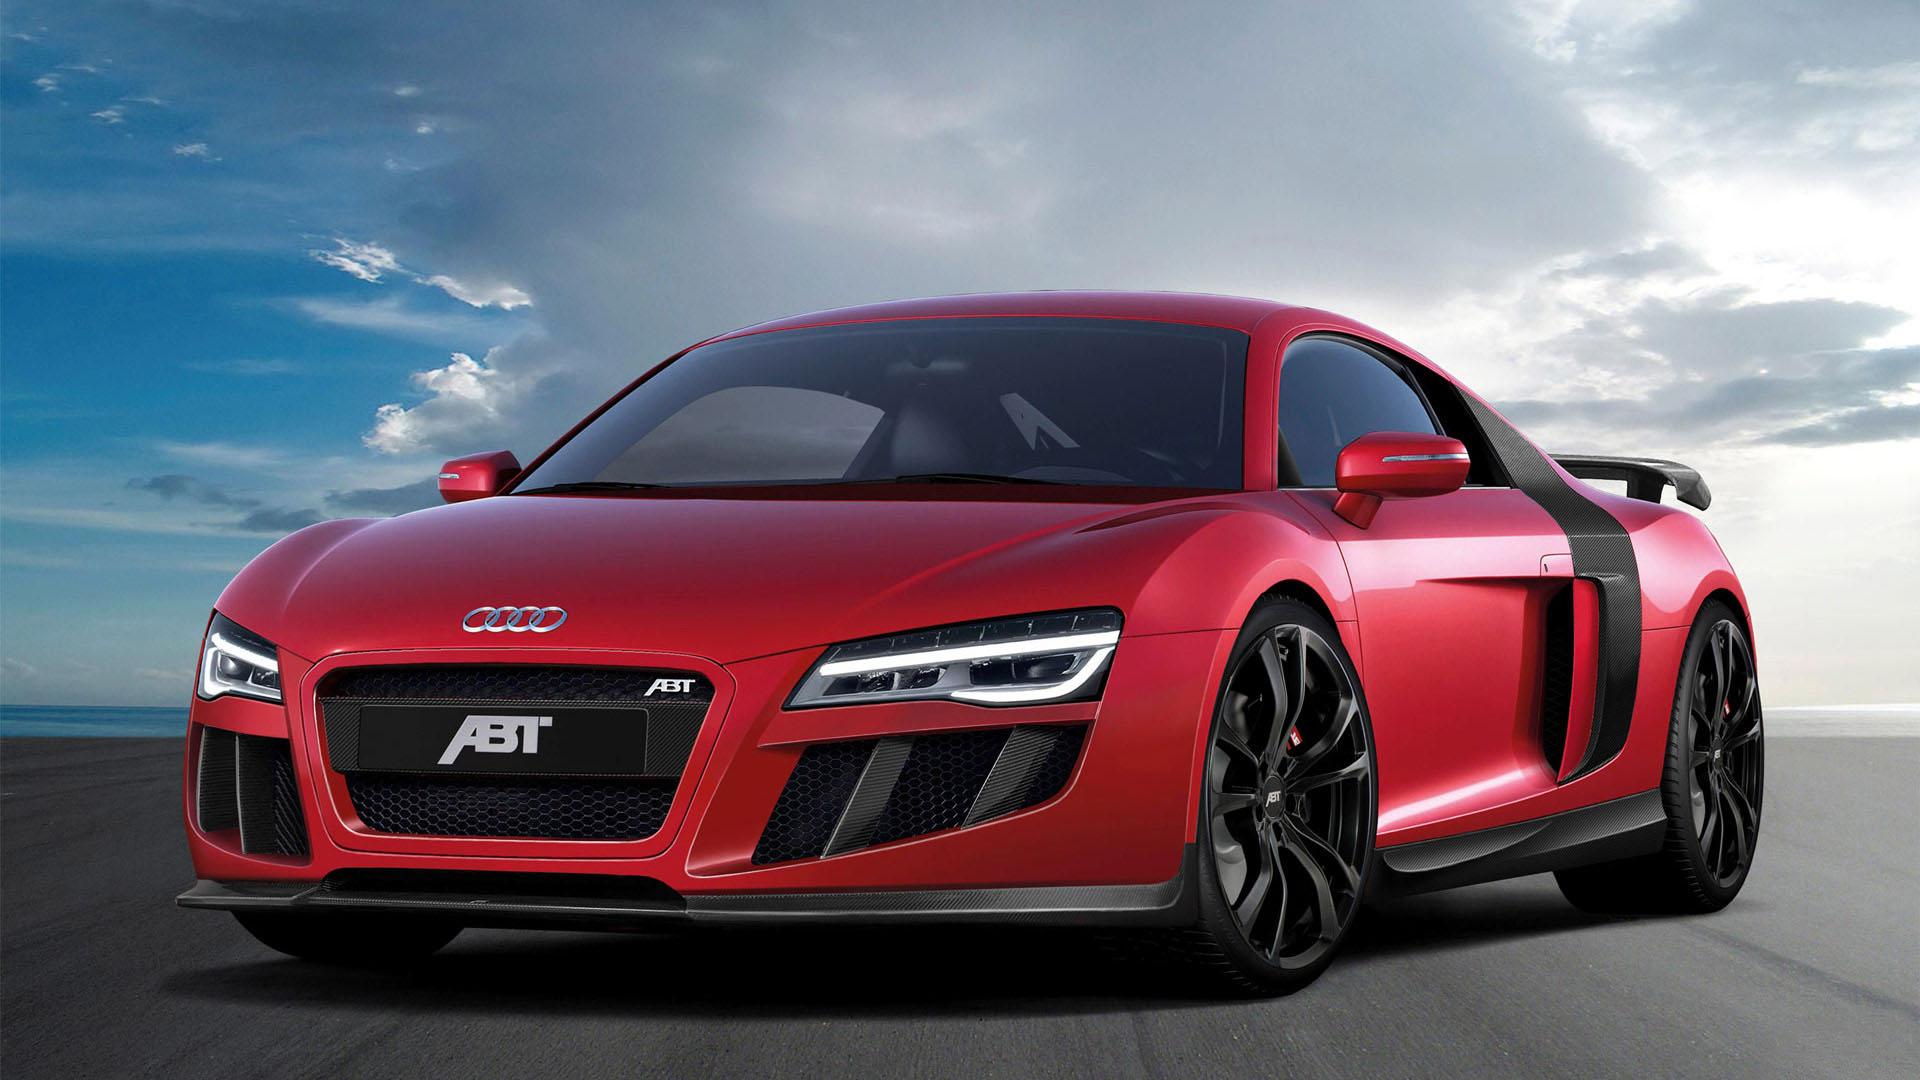 New Red Audi Amaizing Desktop Wallpaper Download Daily Pics 1920x1080